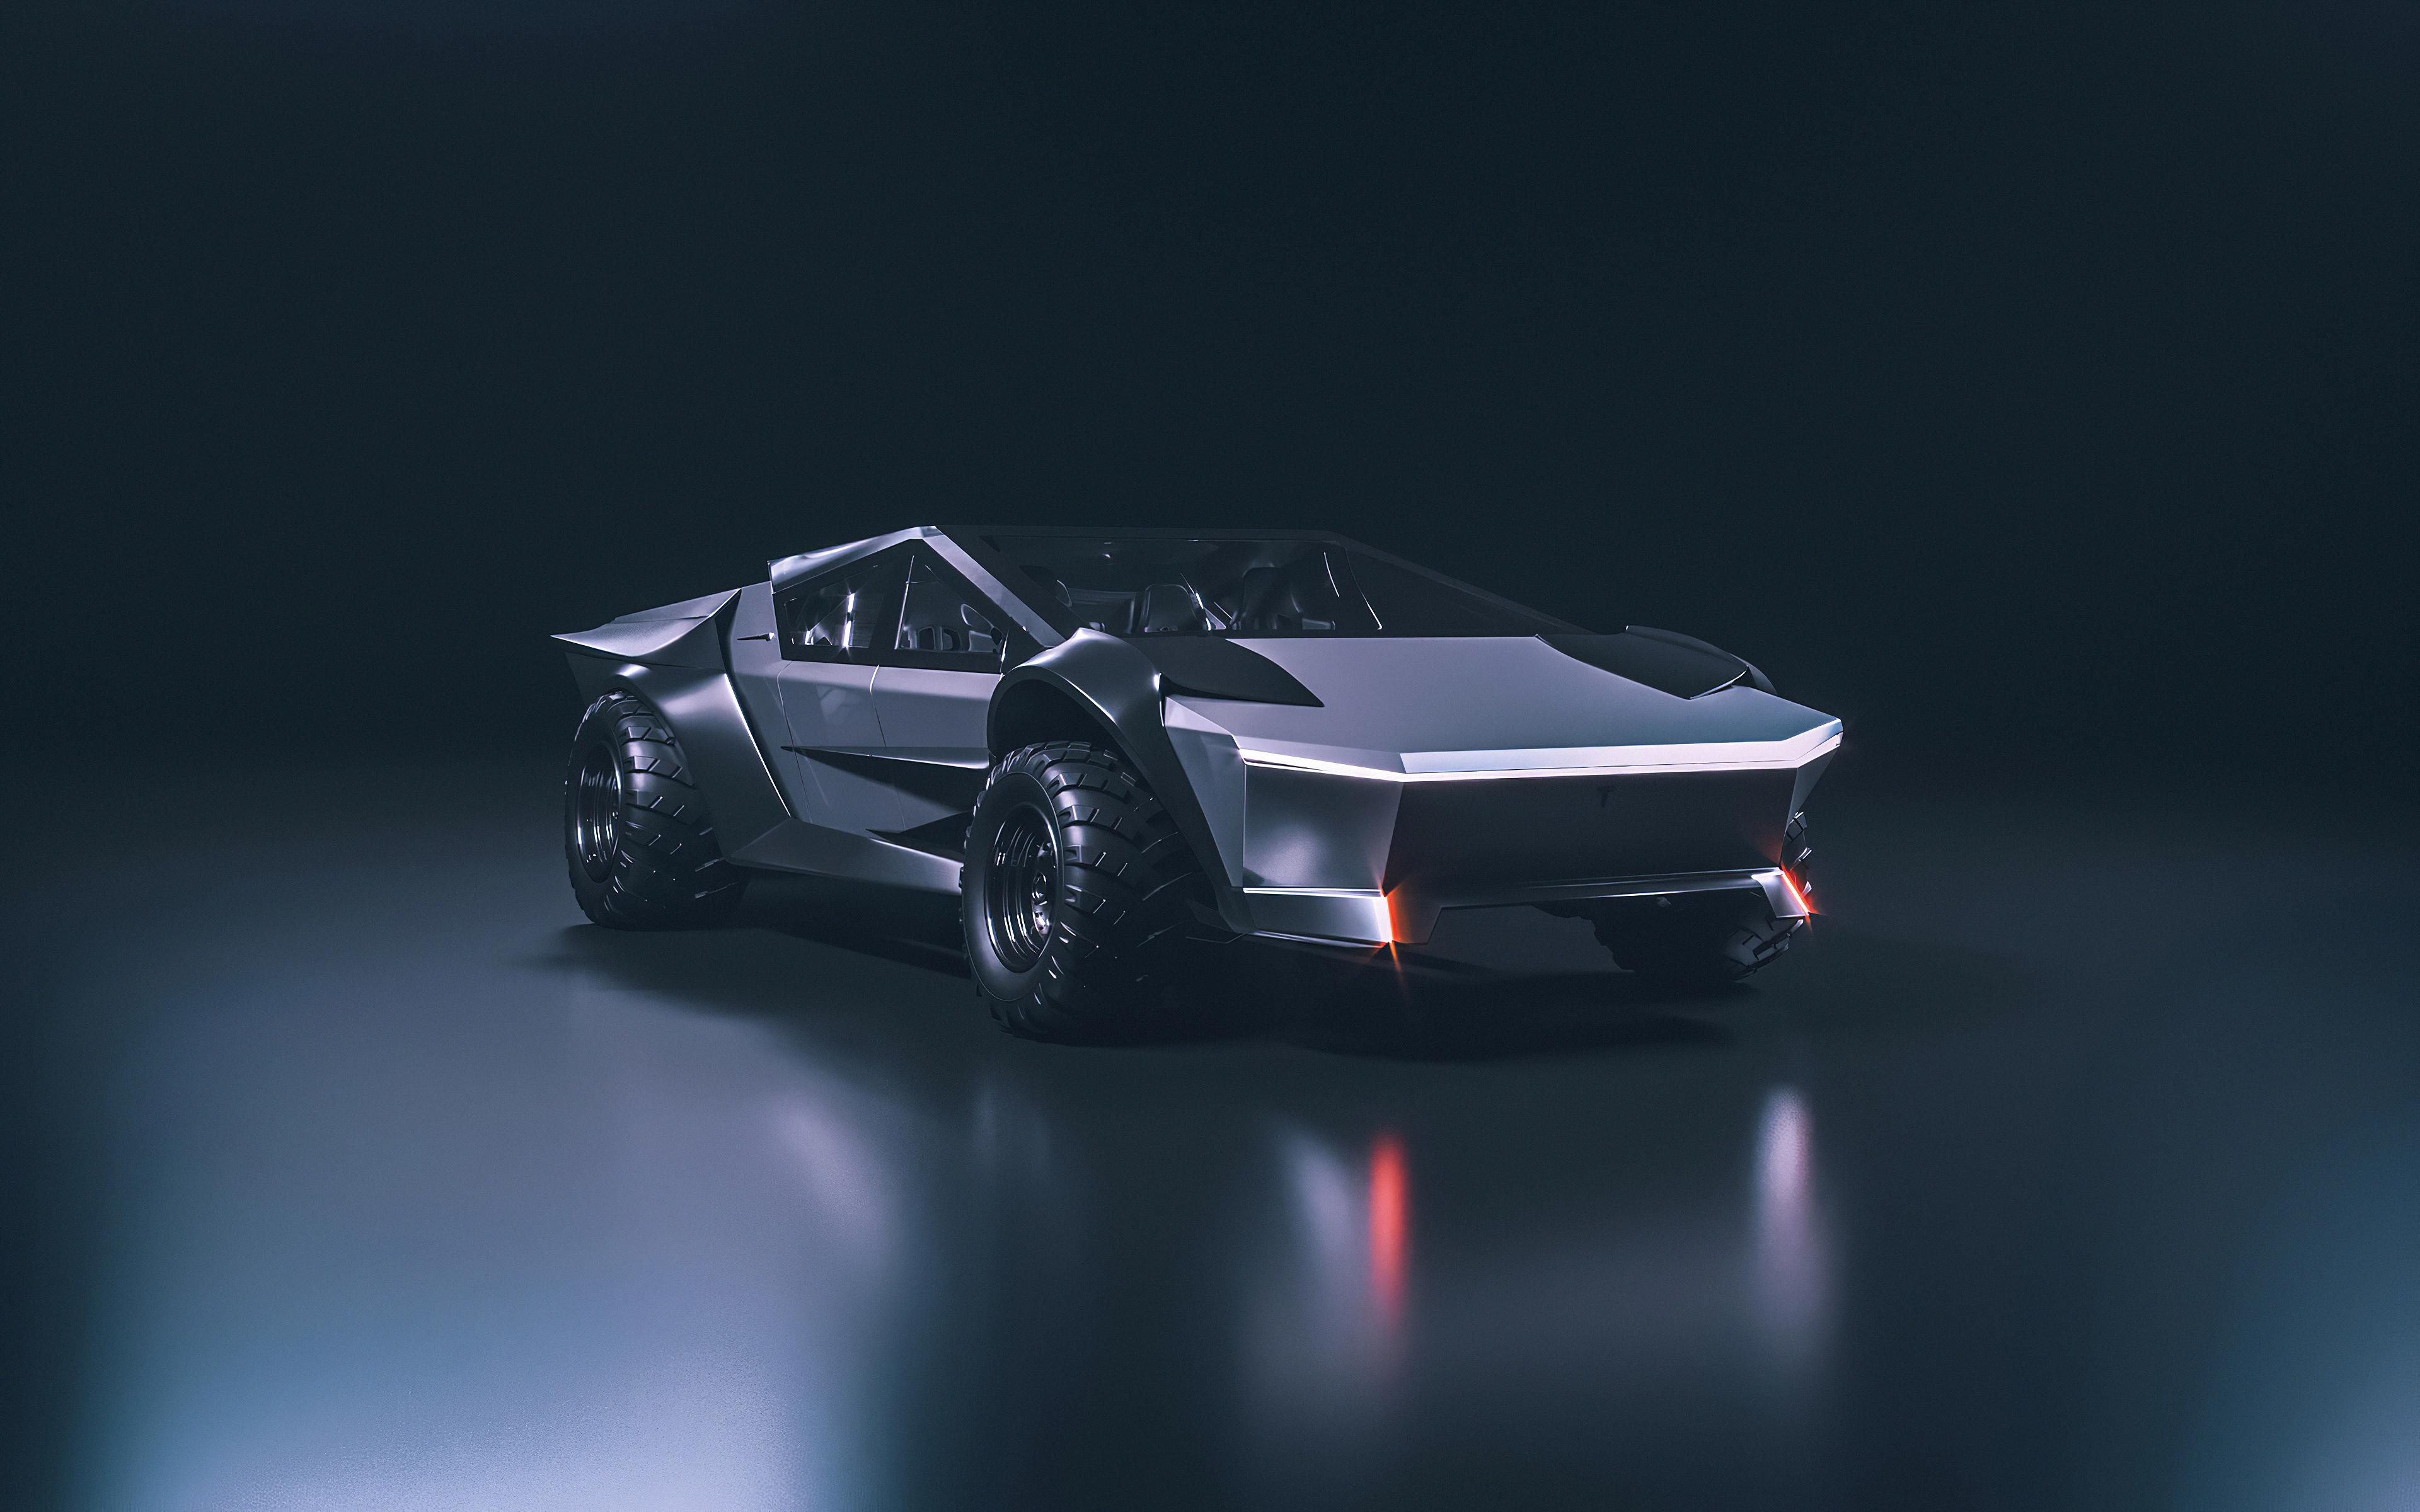 Tesla Cybertruck 4k Wallpaper Concept Cars Black Dark 882